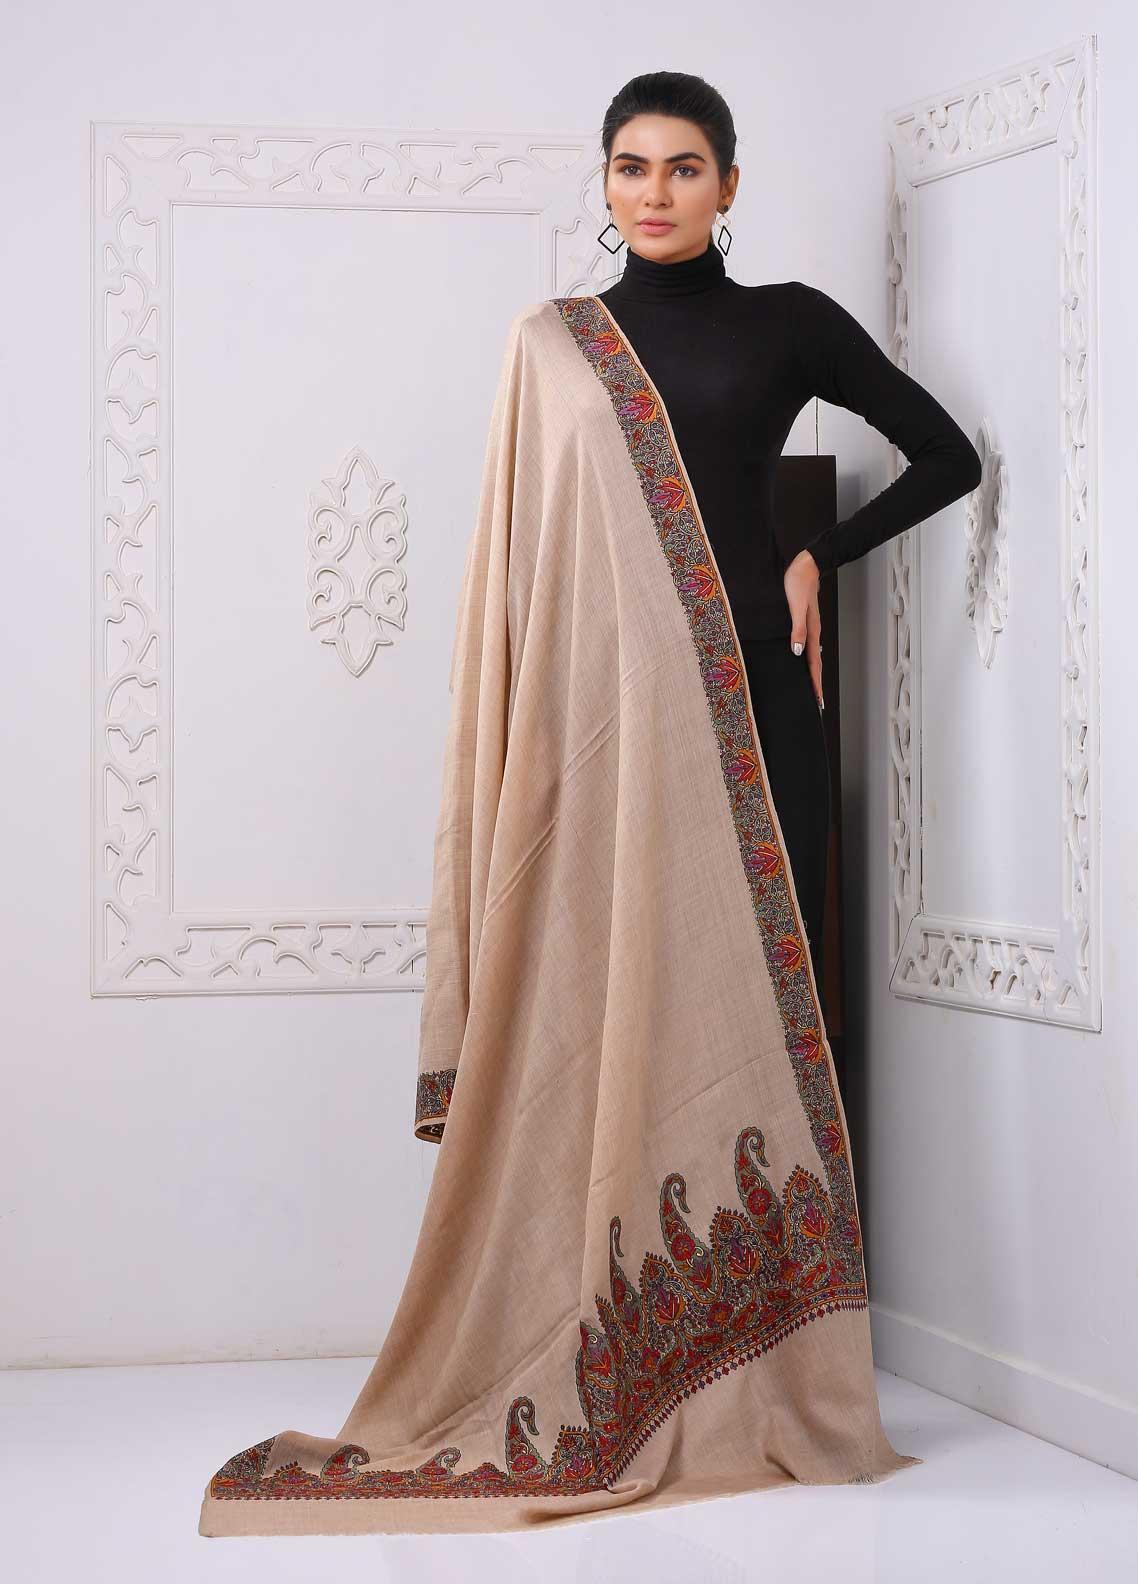 Sanaulla Exclusive Range Embroidered Pashmina  Shawl PMSH 323921 - Pashmina Shawls